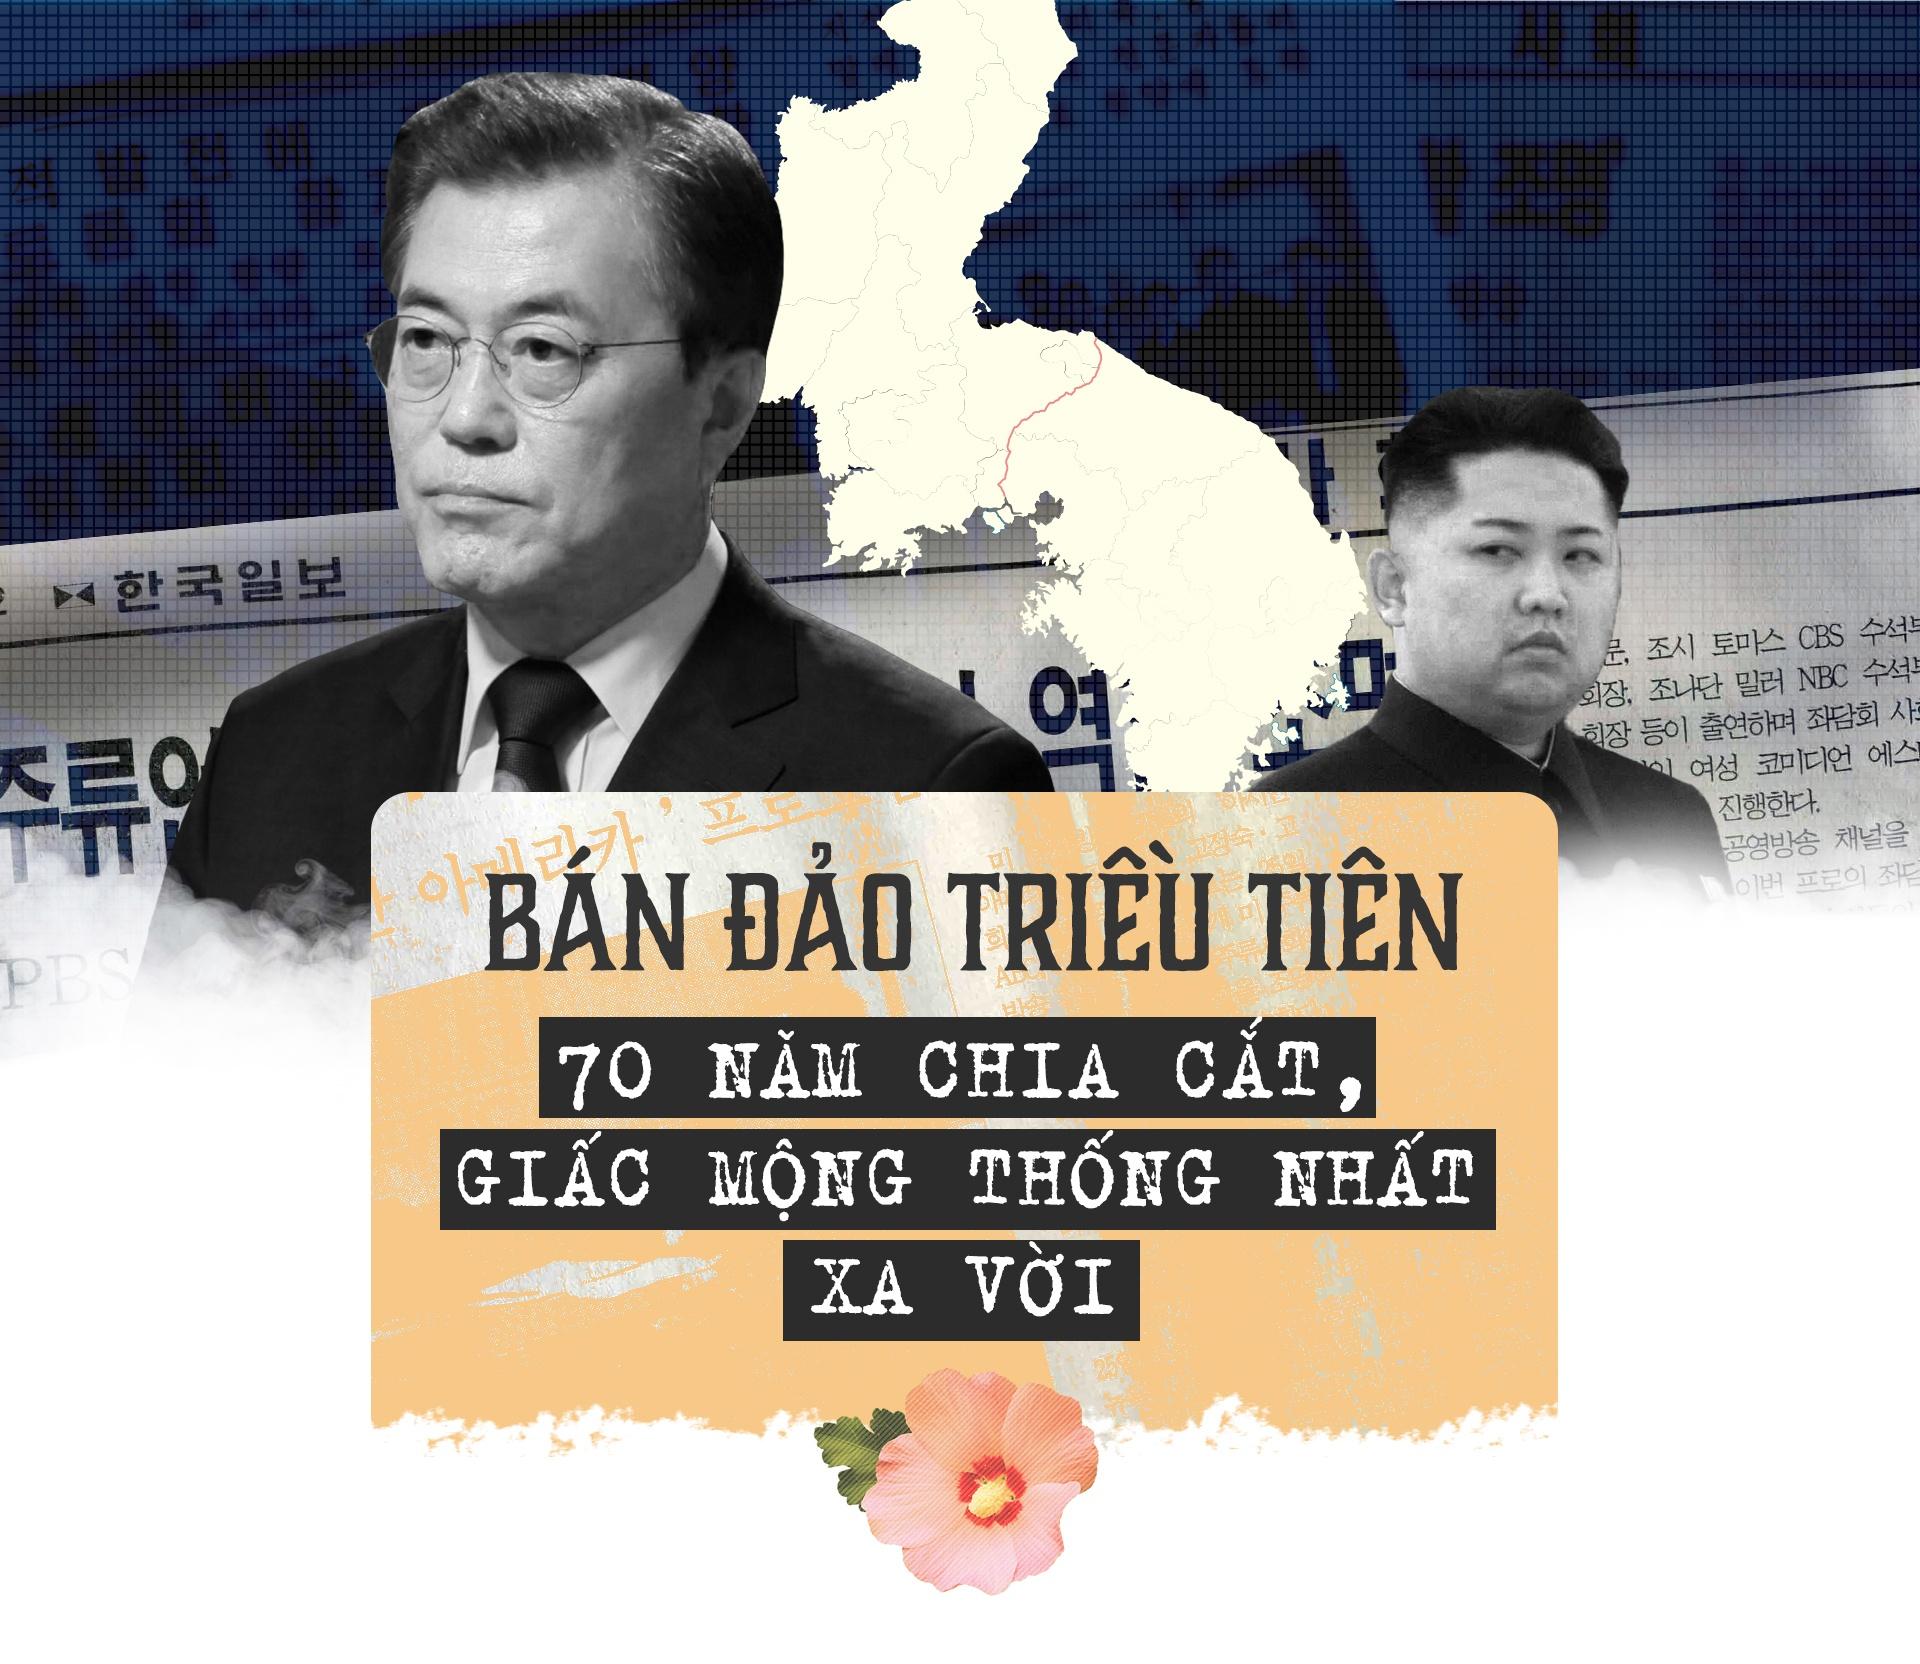 Ban dao Trieu Tien: 70 nam chia cat, giac mong thong nhat van con xa hinh anh 2